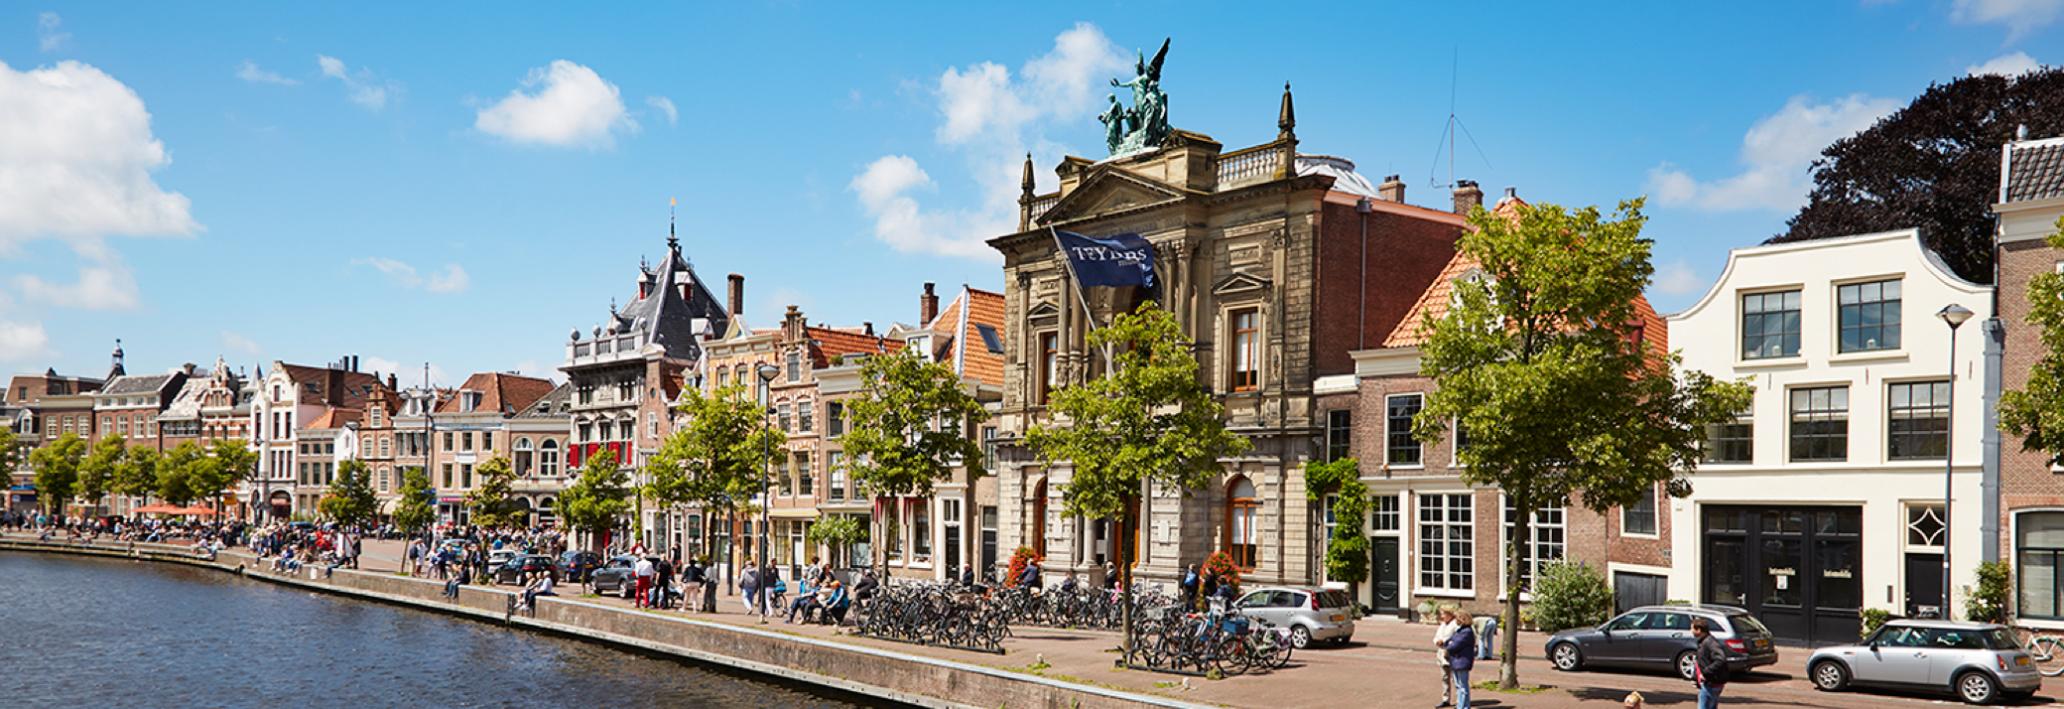 Haarlem summer time